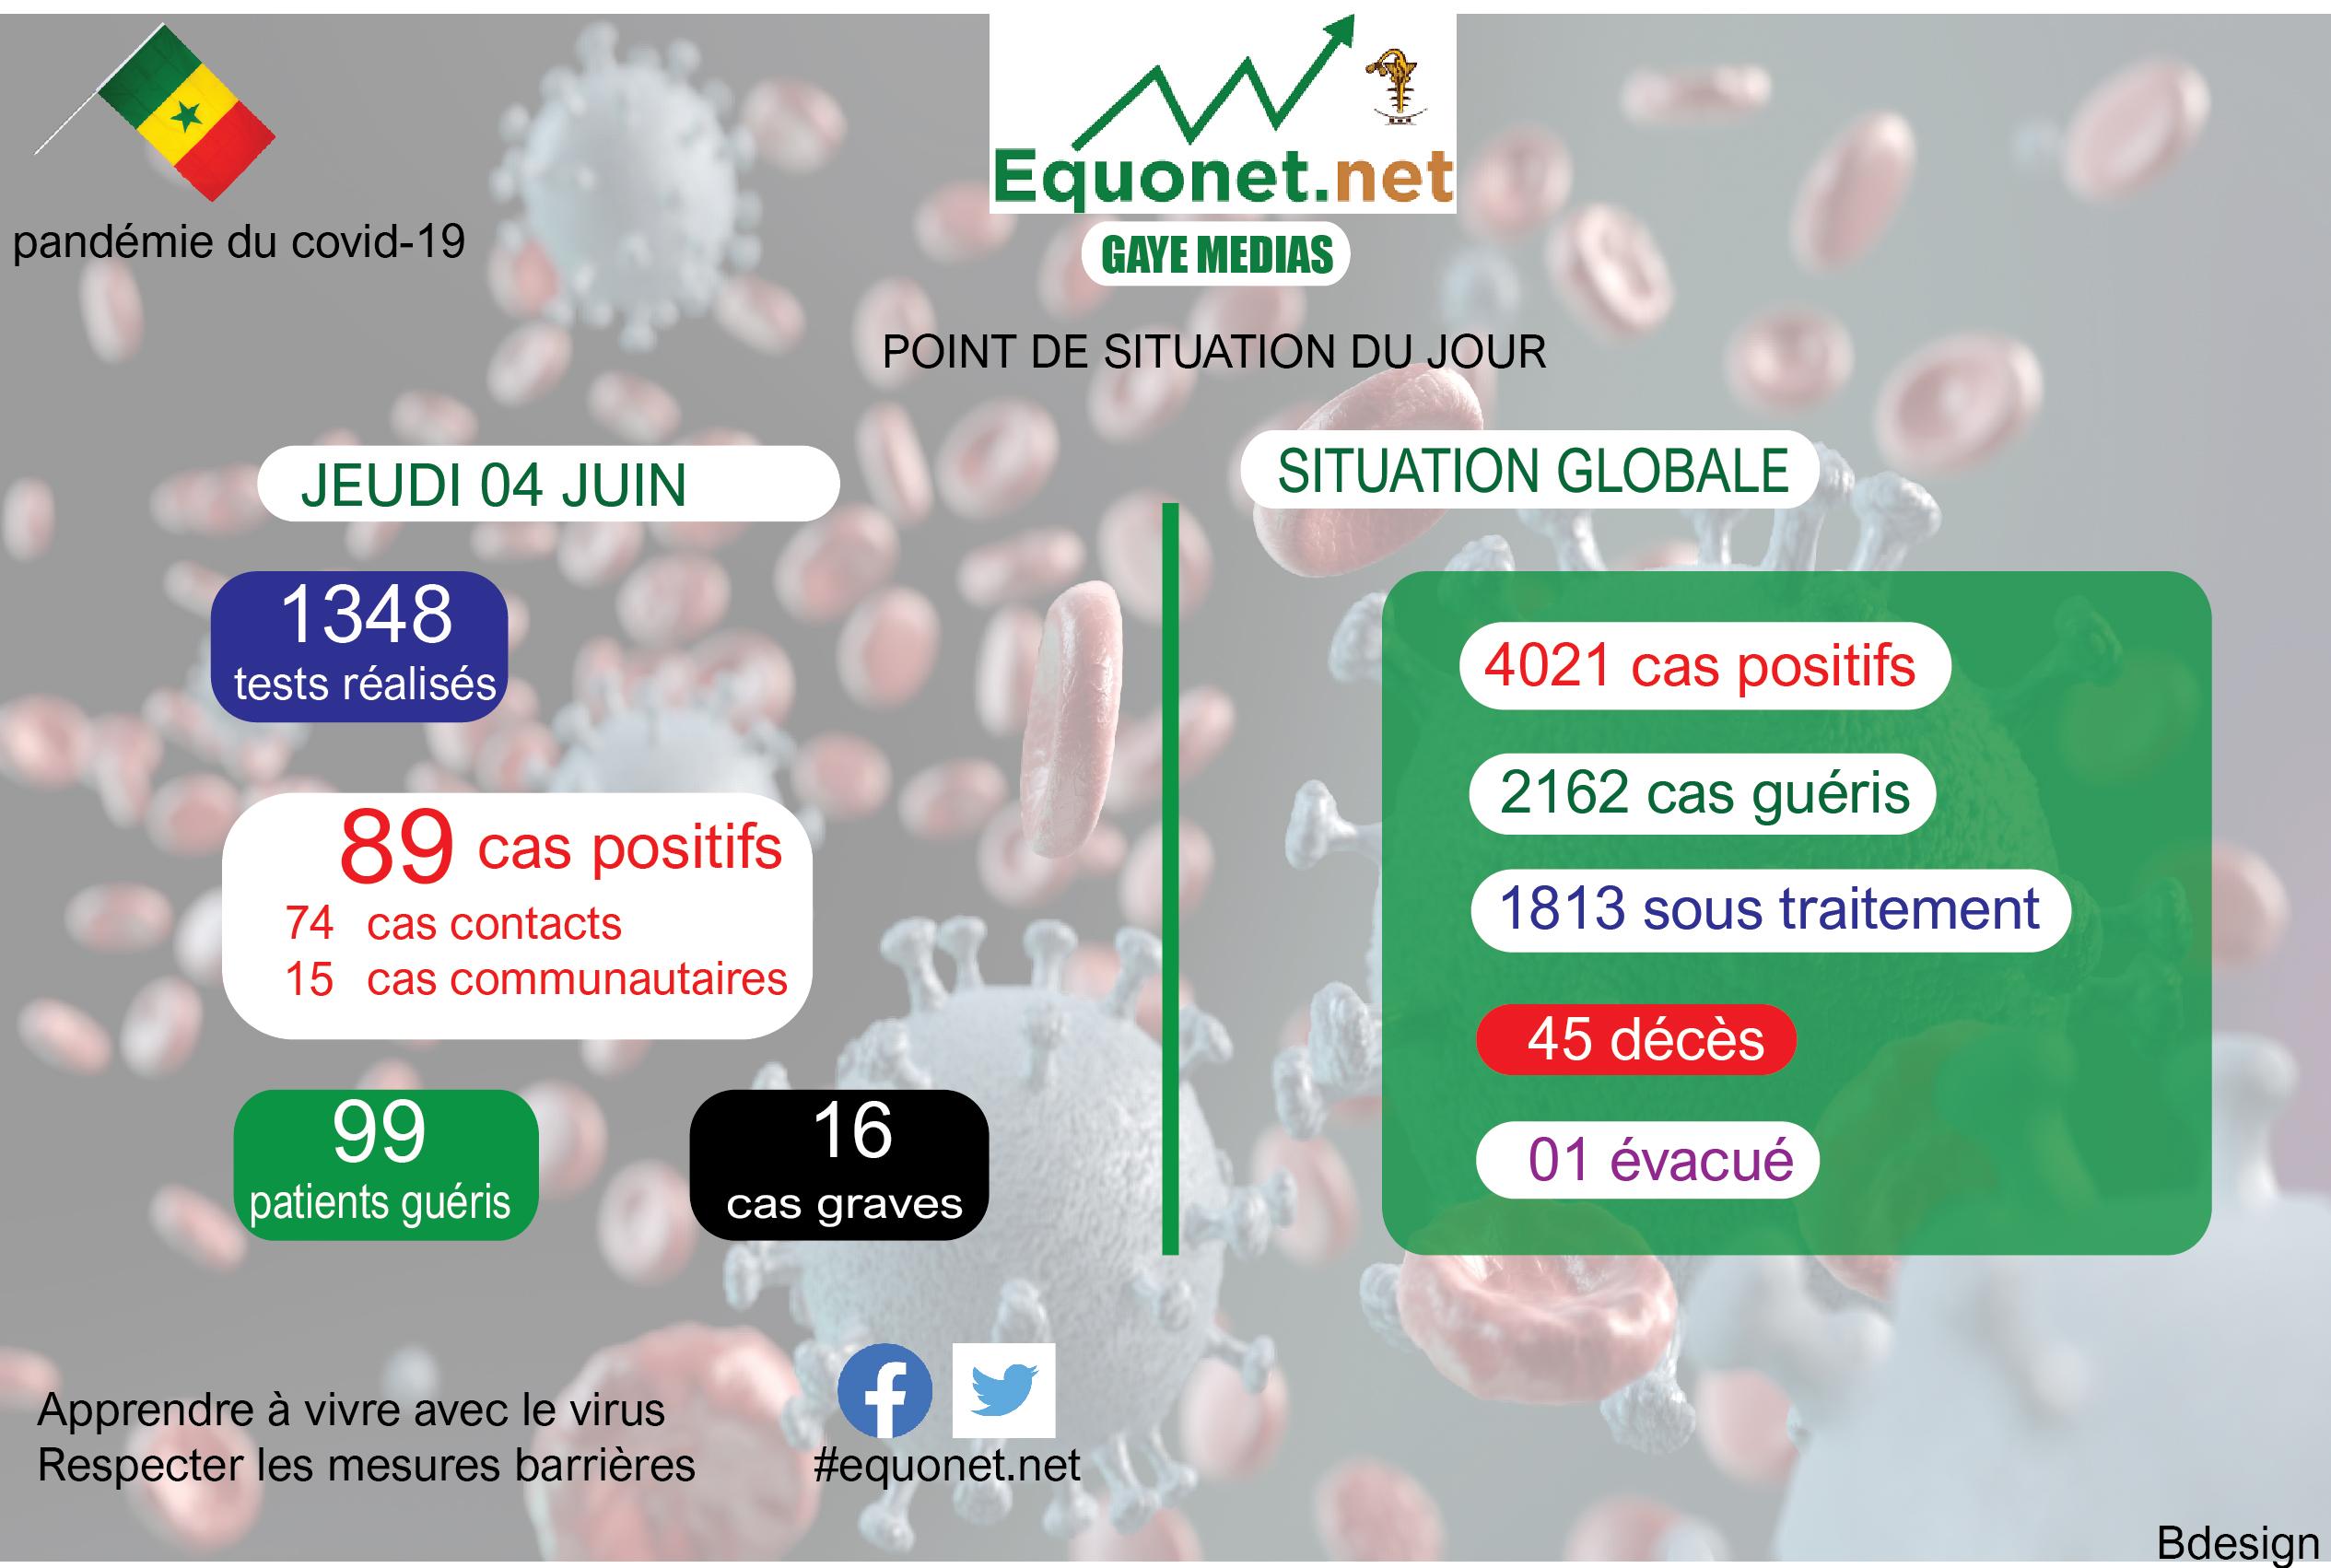 pandémie du coronavirus-covid-19 au sénégal : point de situation du jeudi 04 juin 2020